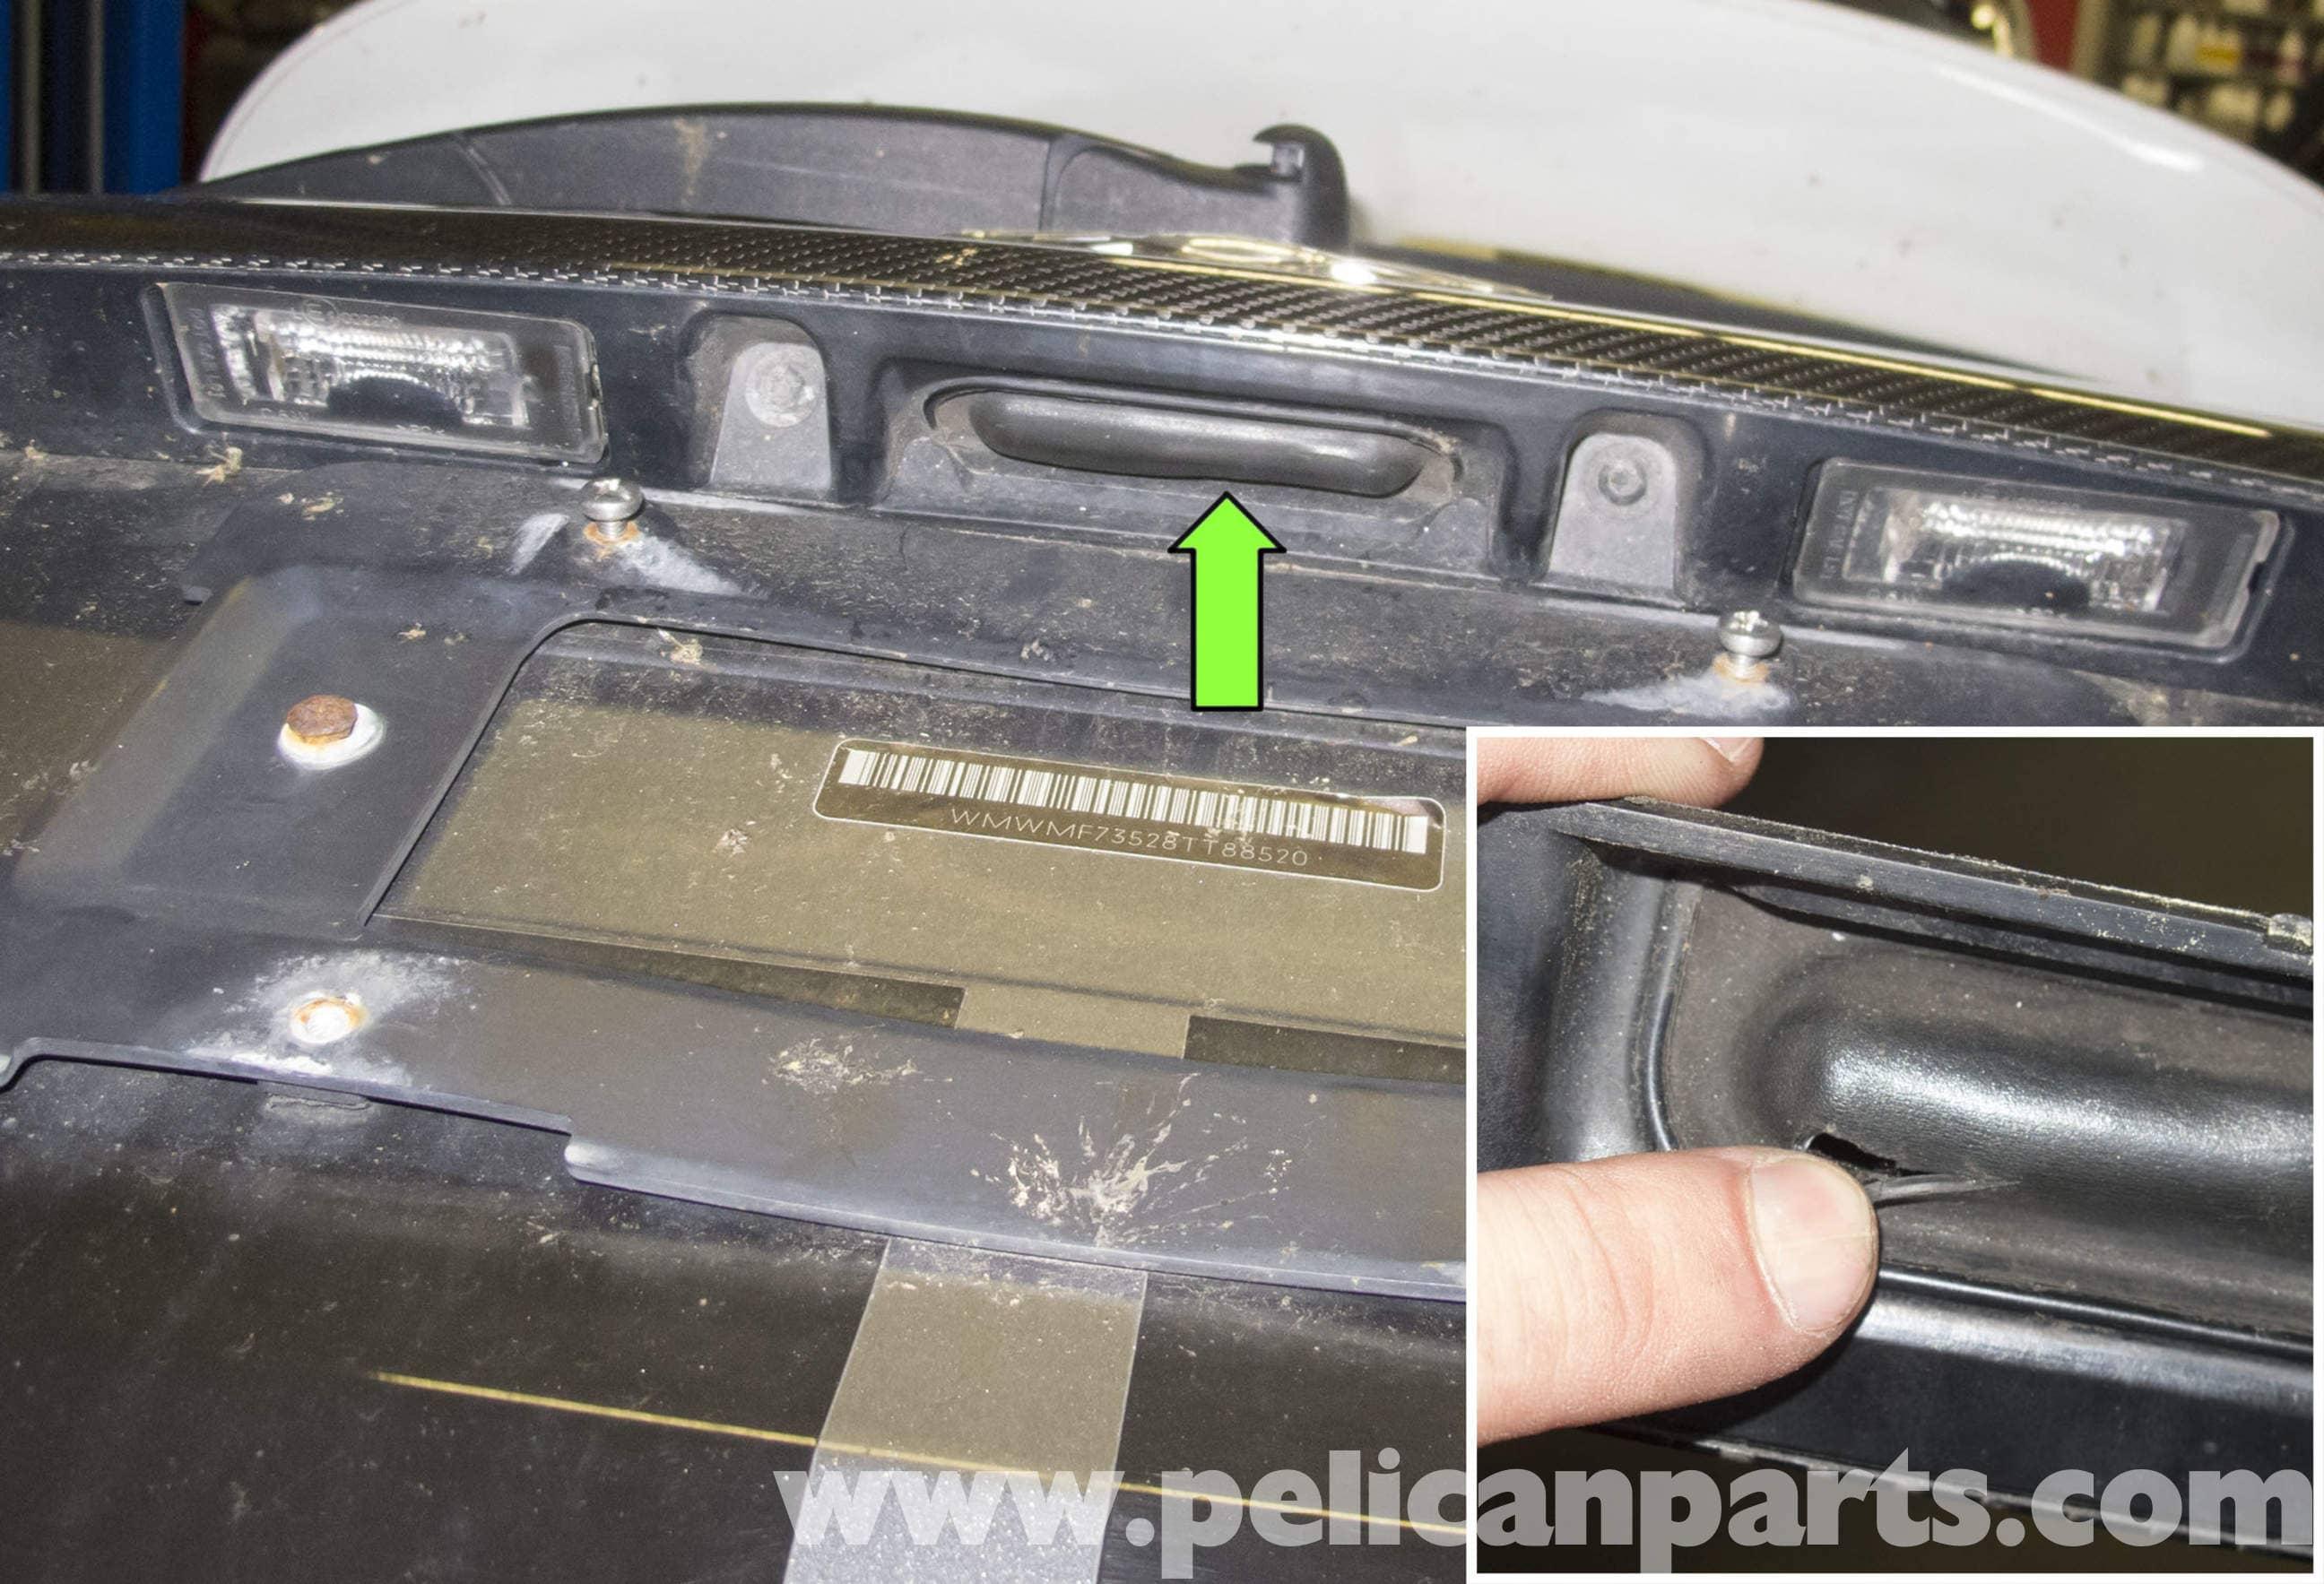 2005 mini cooper tailgate diagrams find wiring diagram \u2022 2009 subaru forester engine diagram 2005 mini cooper tailgate diagrams car fuse box wiring diagram u2022 rh smjockey co 2008 mini